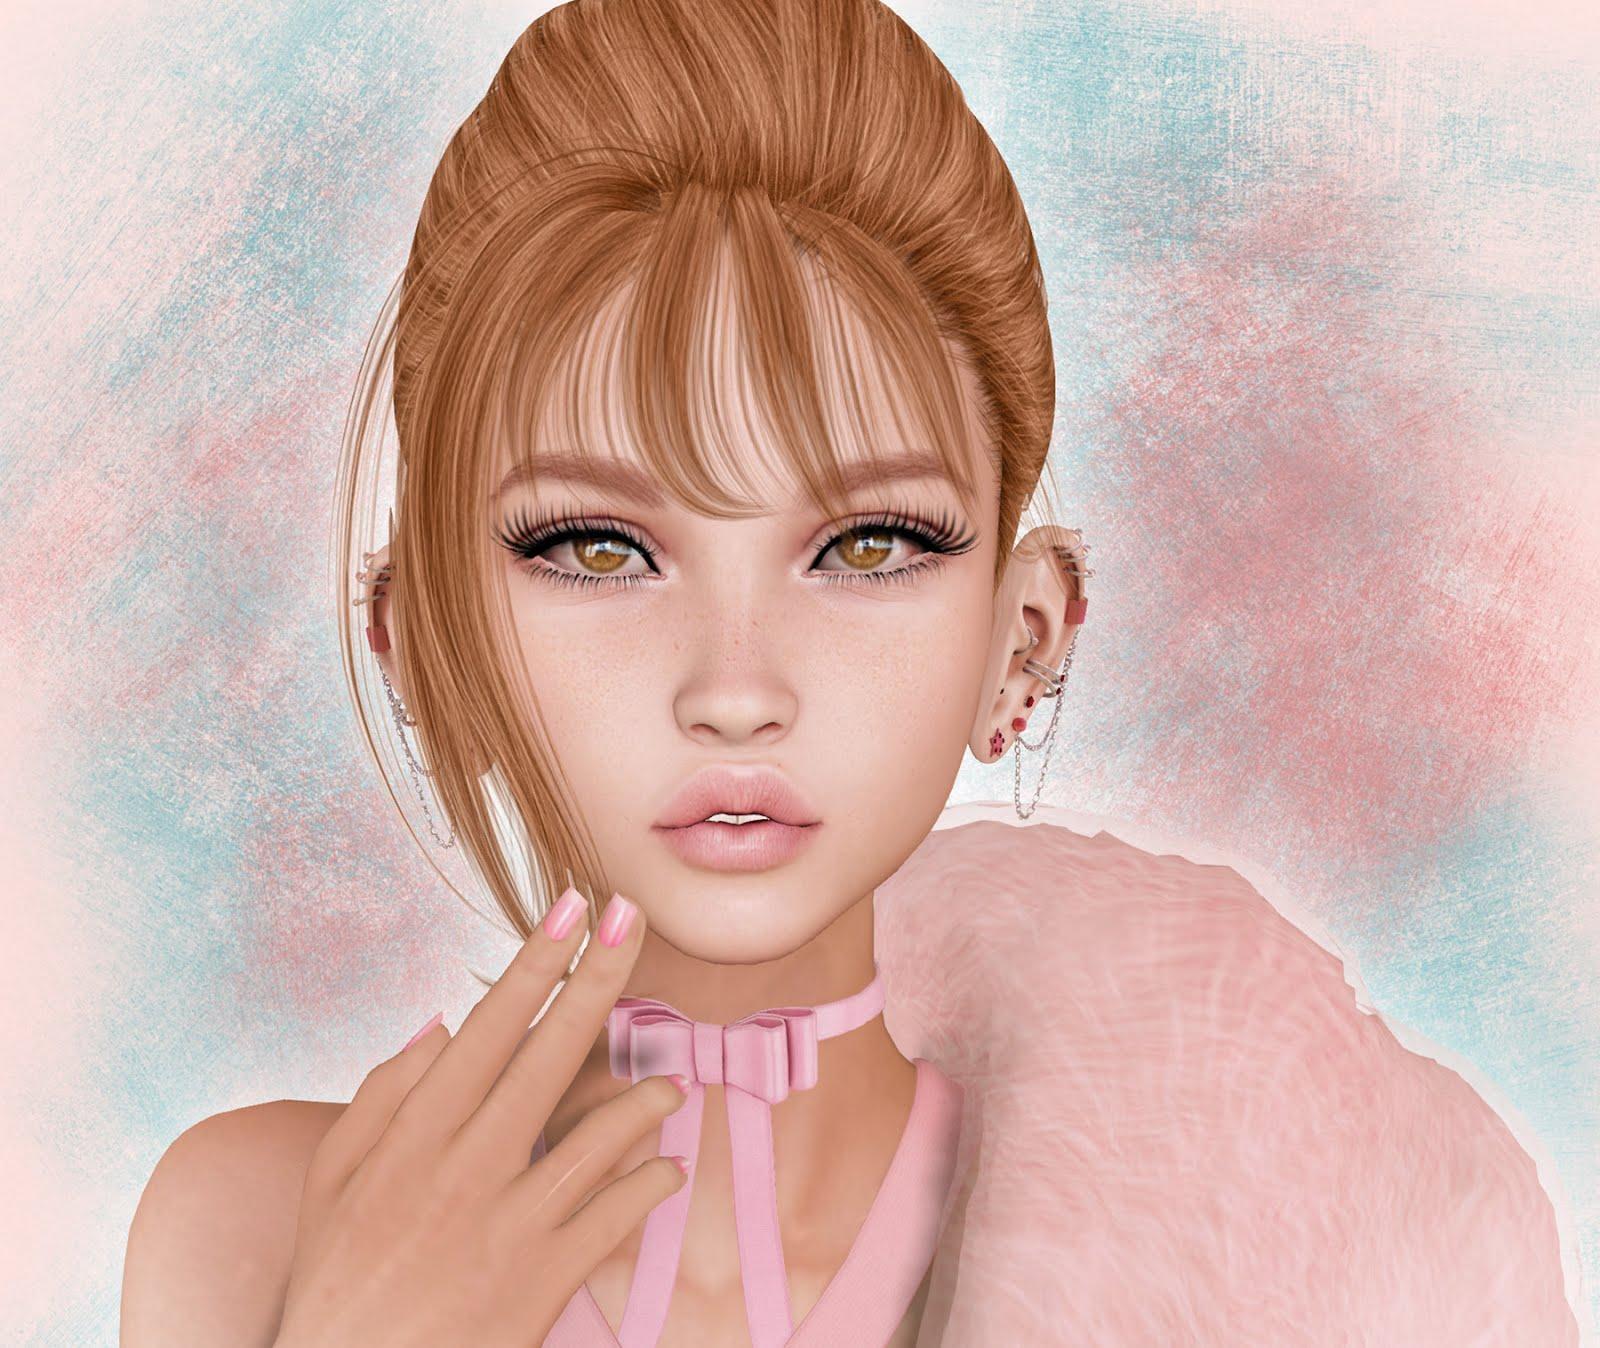 Cinderella Fashionista: LAQ @ Skin Fair 2018